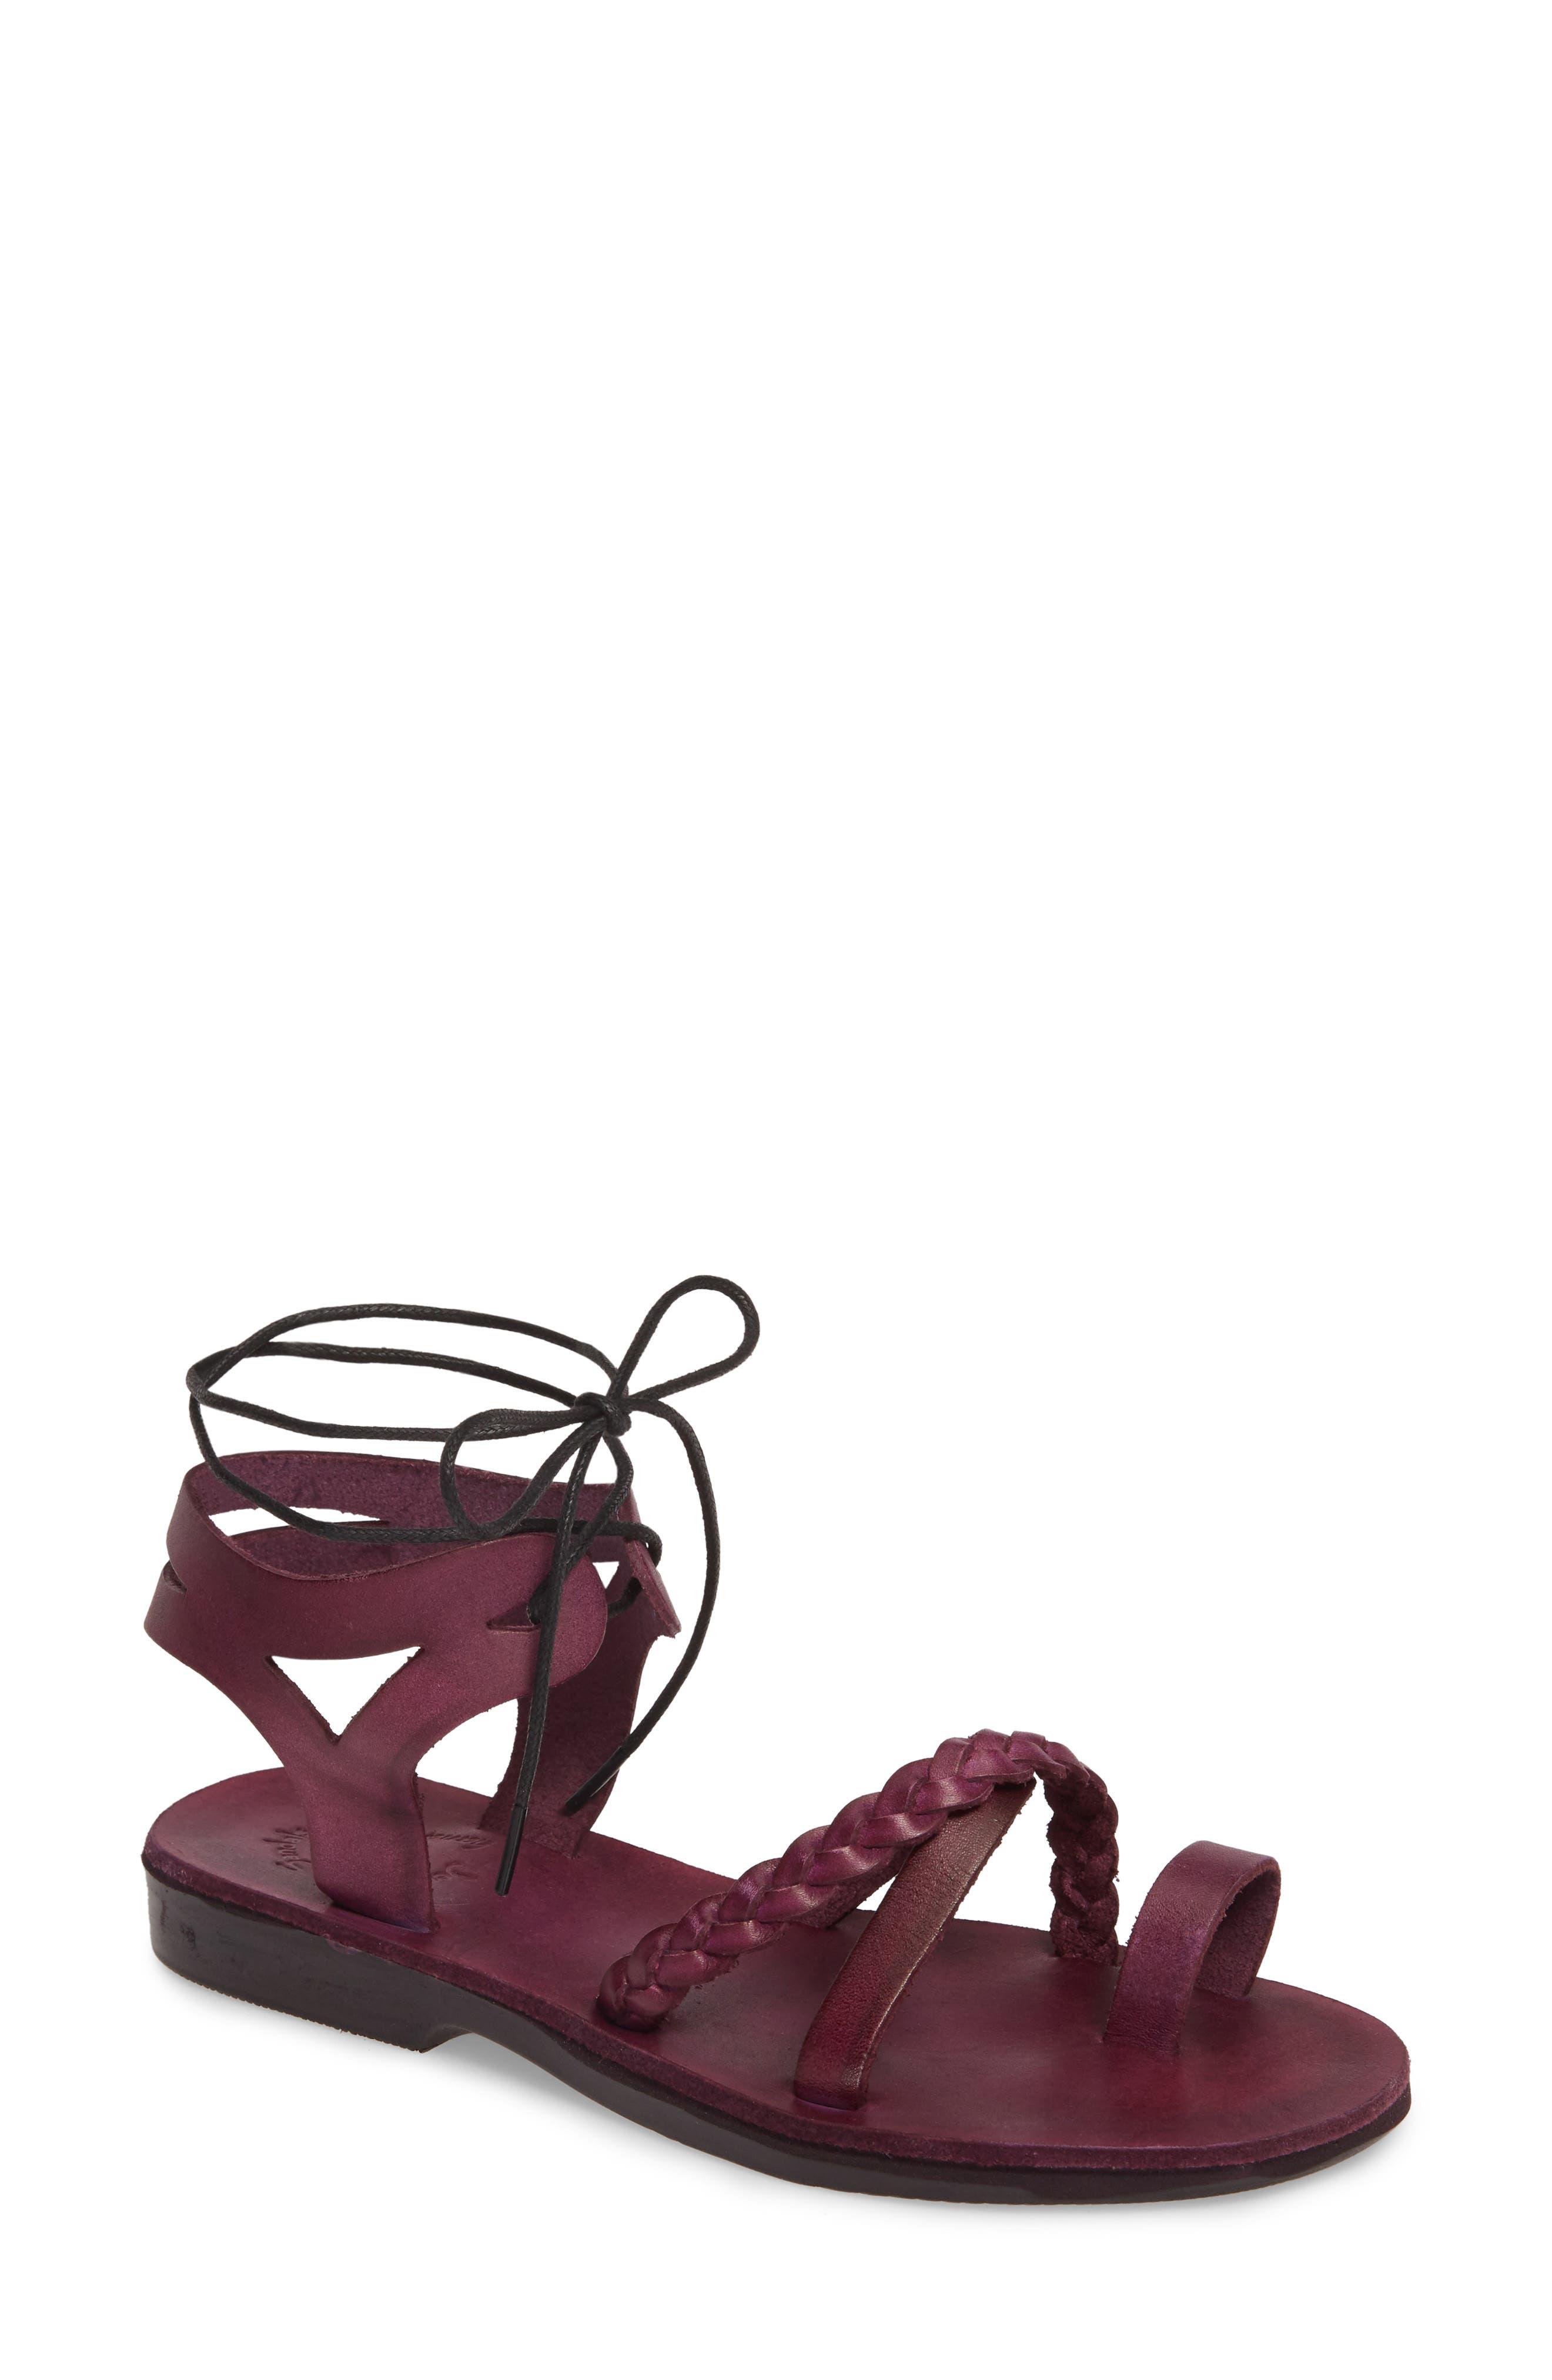 Ramah Wraparound Sandal